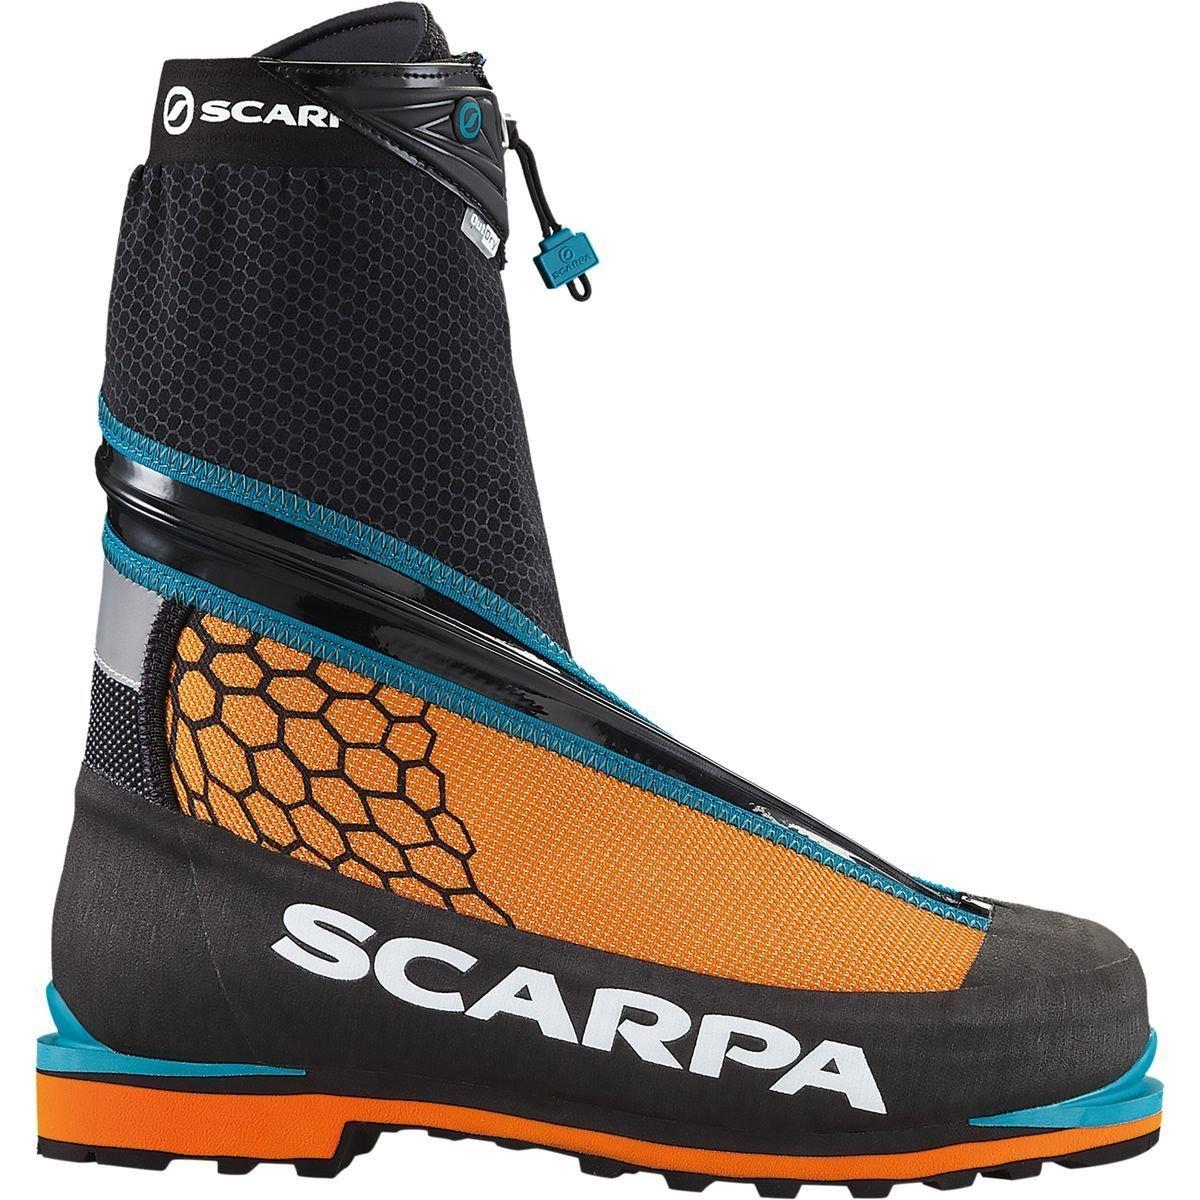 Scarpa Men's Phantom Tech M Mountaineering Boot, Black/Orange, 46.5 EU/12.5 M US